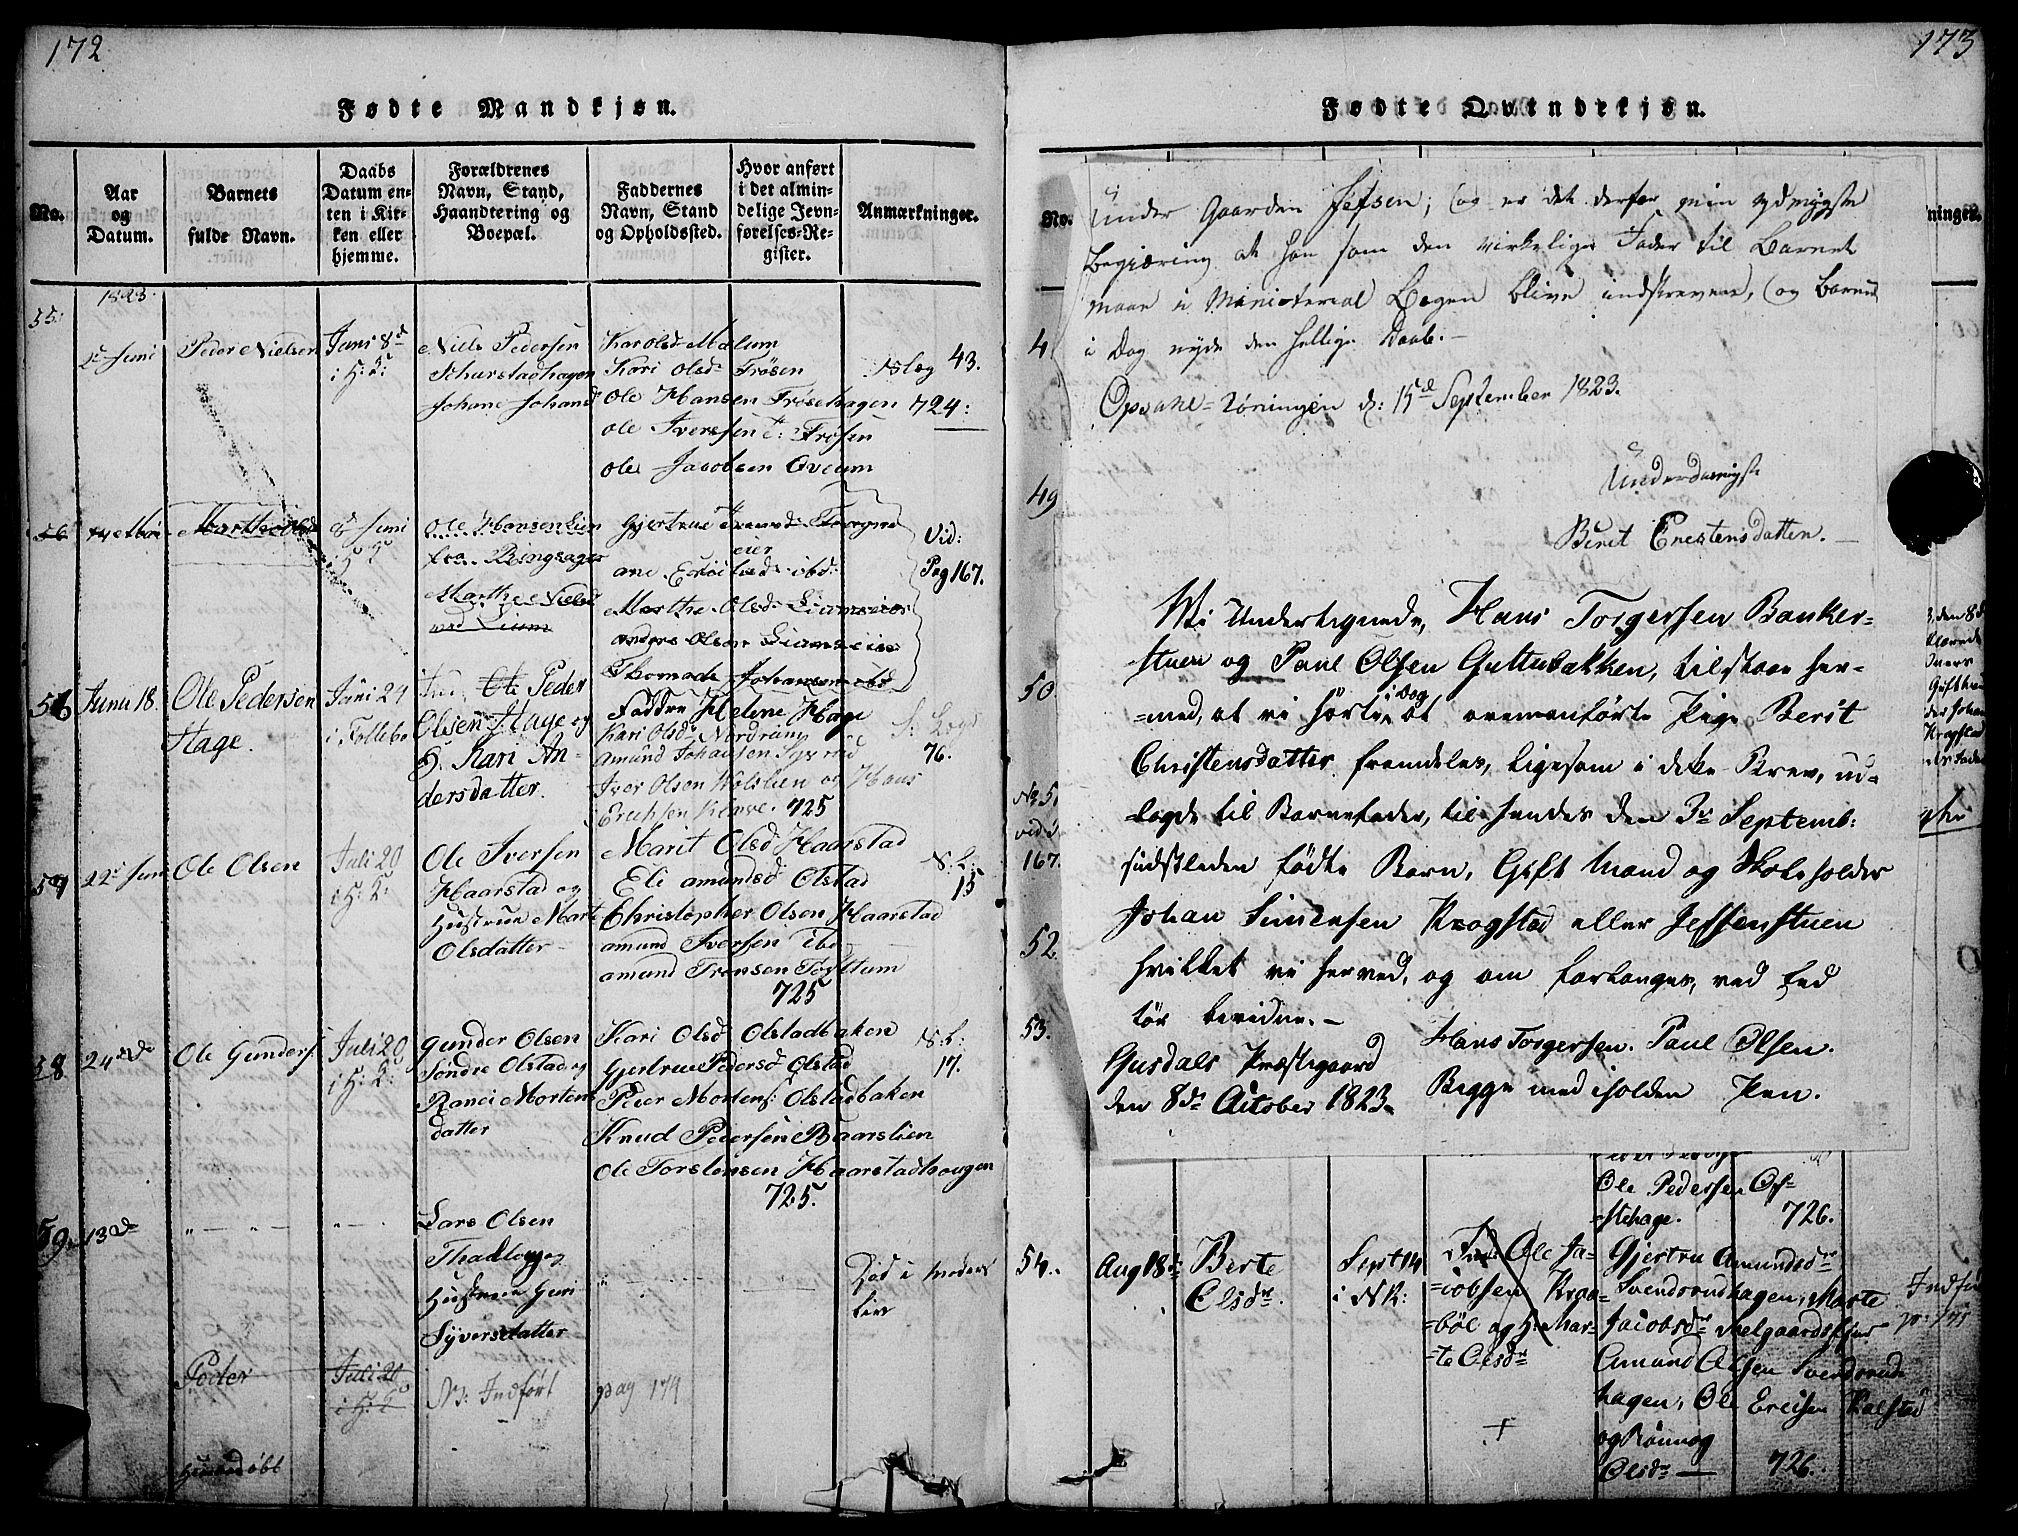 SAH, Gausdal prestekontor, Ministerialbok nr. 5, 1817-1829, s. 172-173